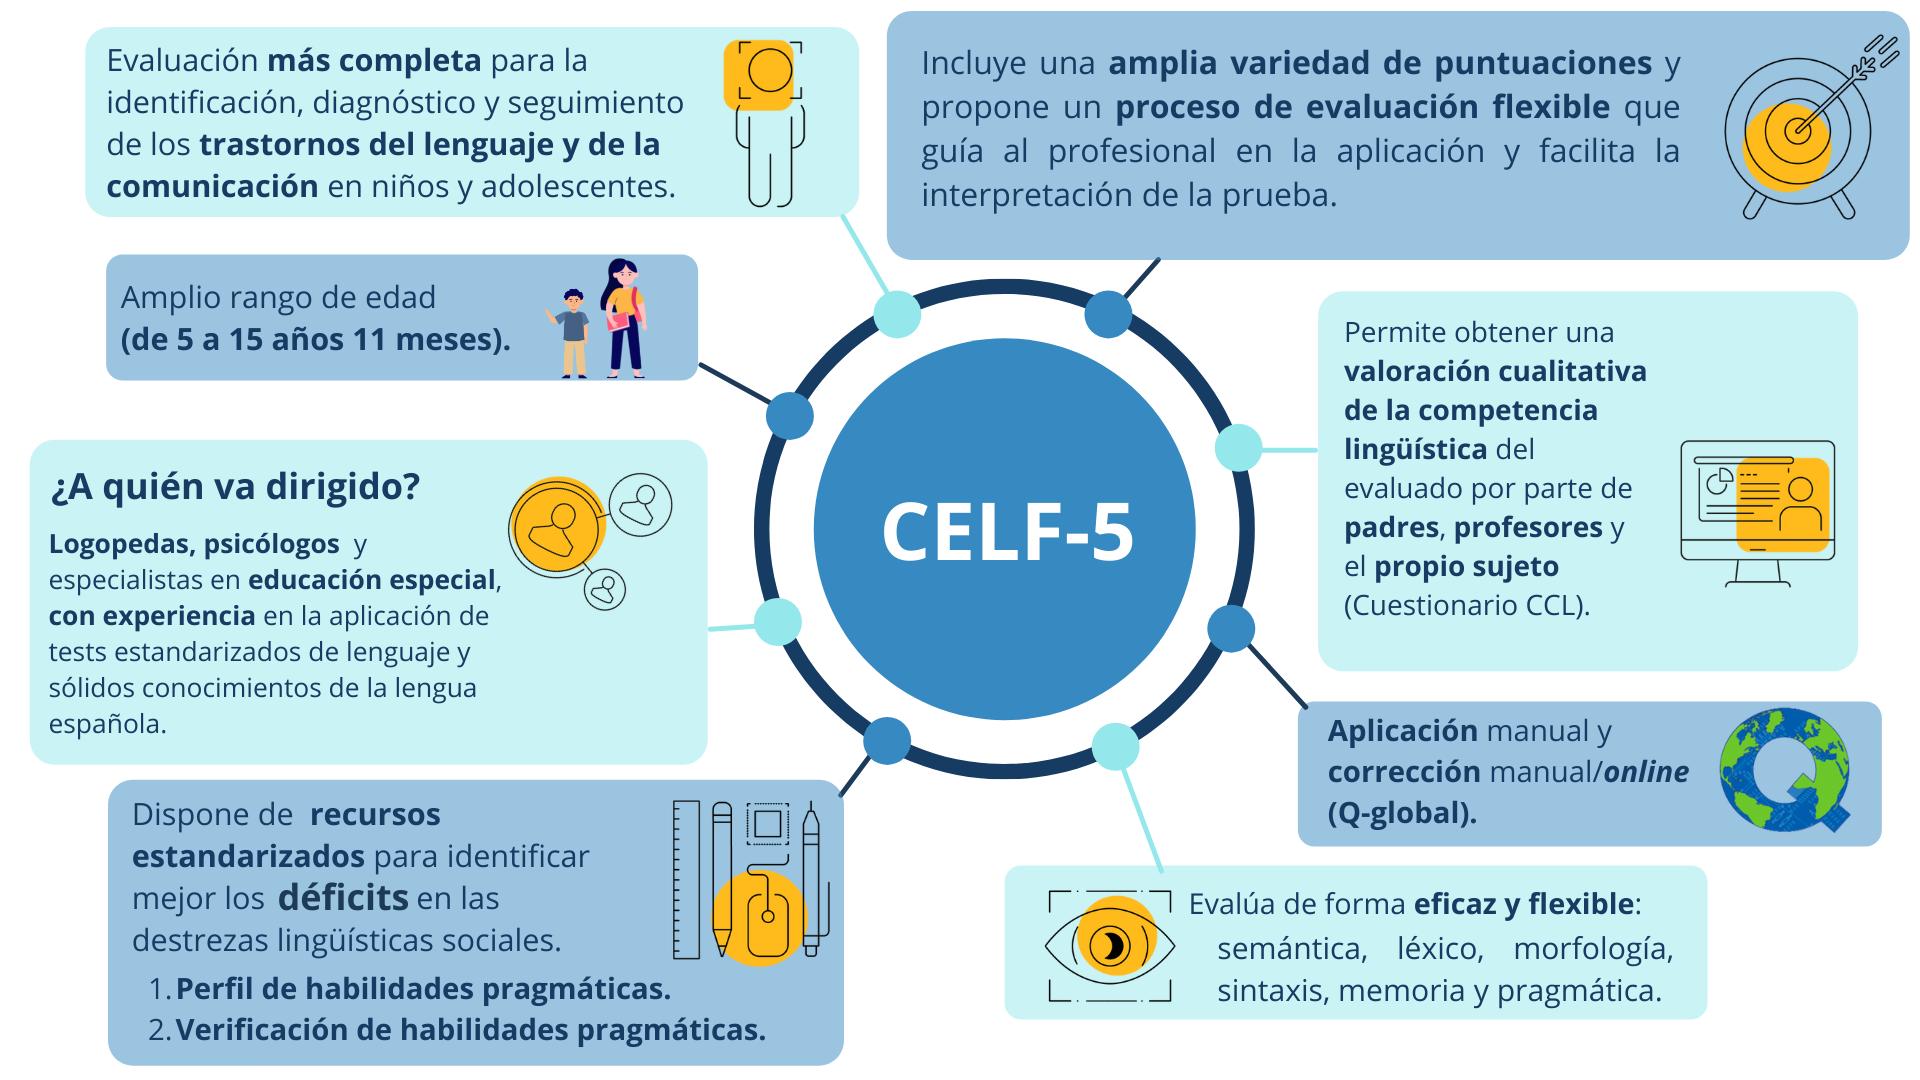 Facts-CELF-5